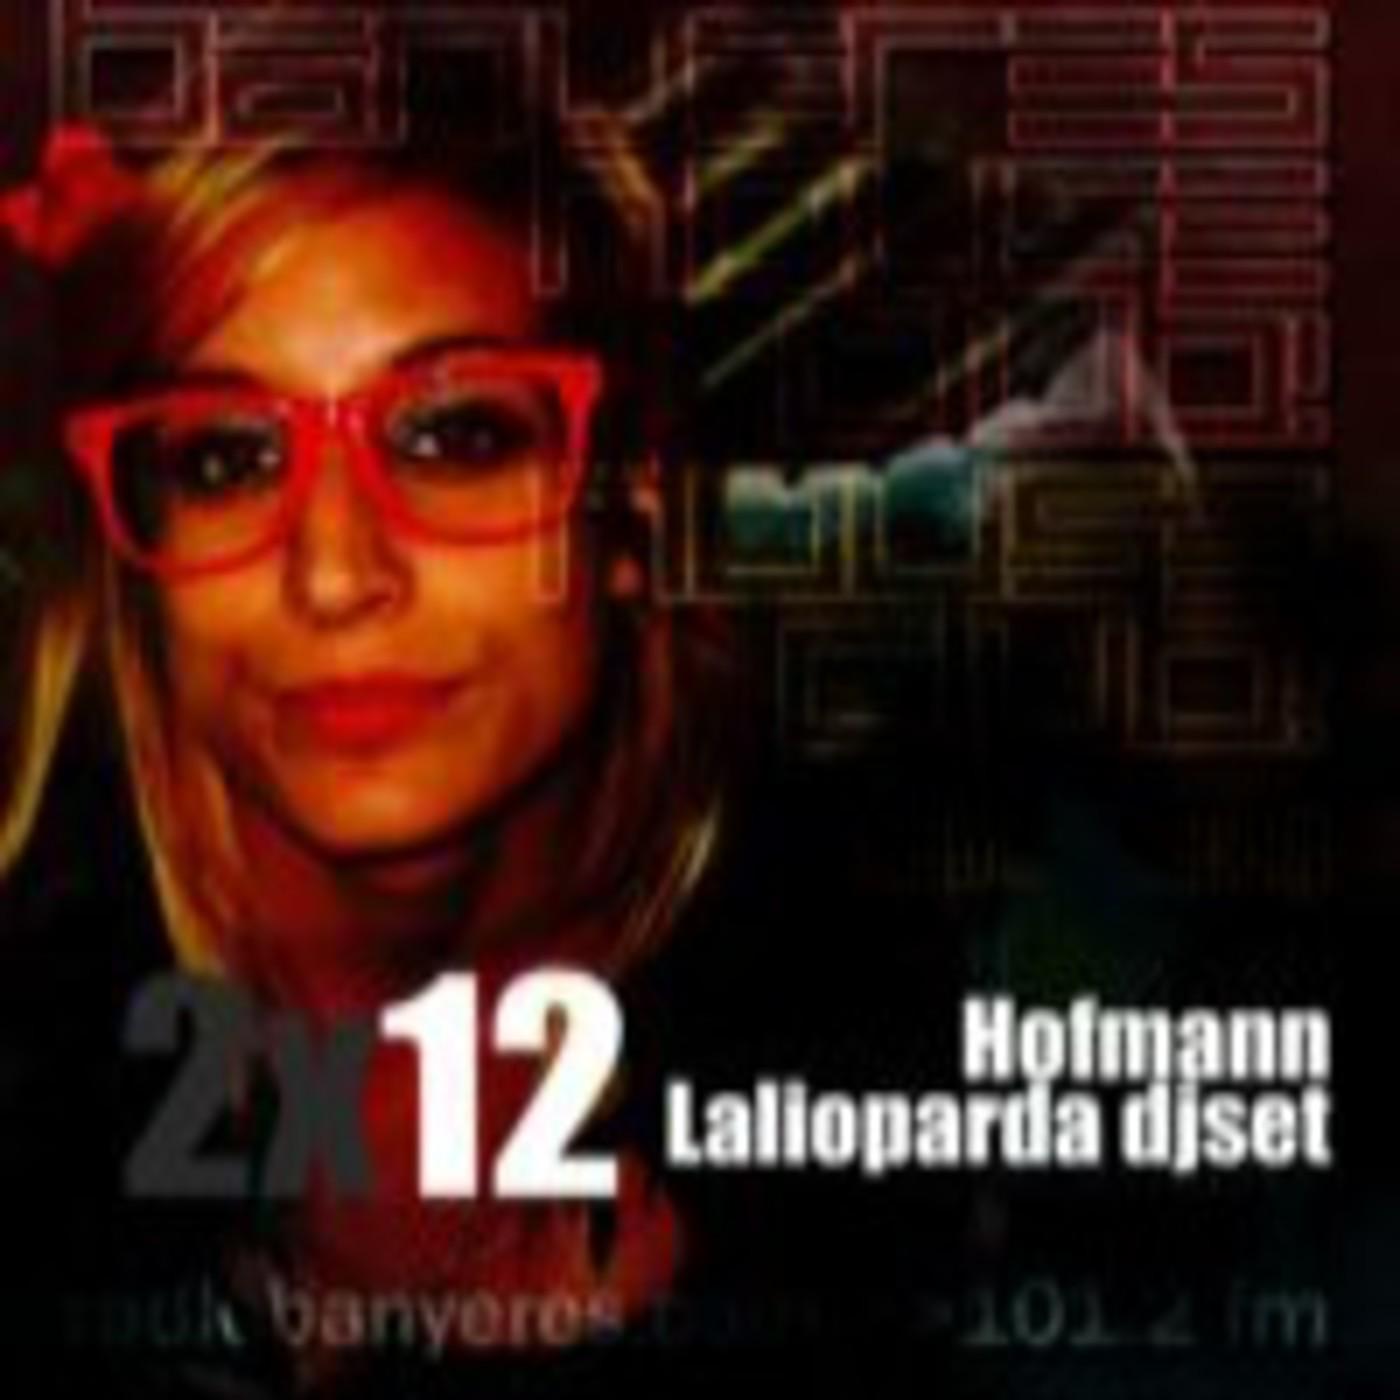 BHC2x12 - 22/11/2014 Hofmann Lalioparda - Electroswing djset